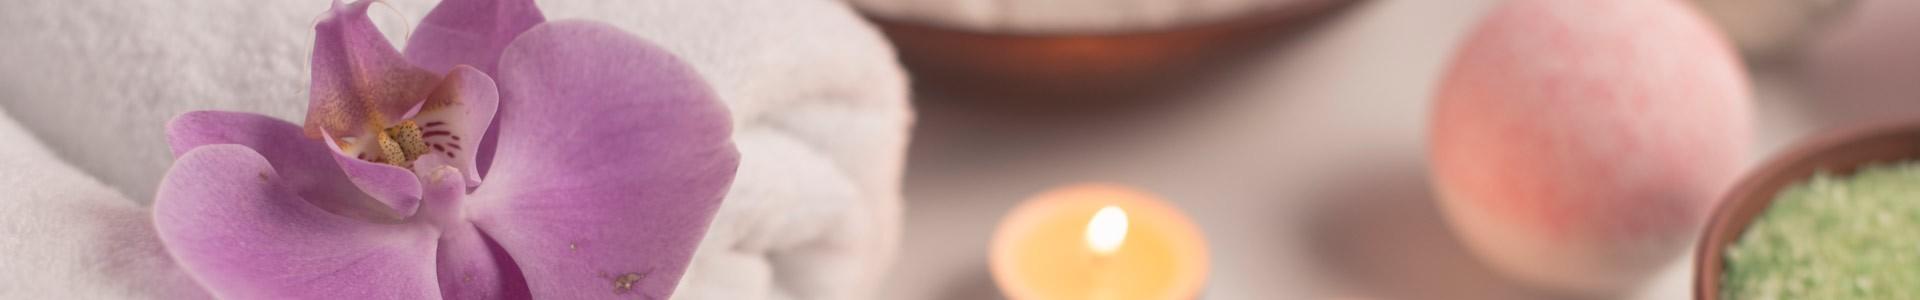 Badeprodukte für die Körperpflege| Körperpeeling